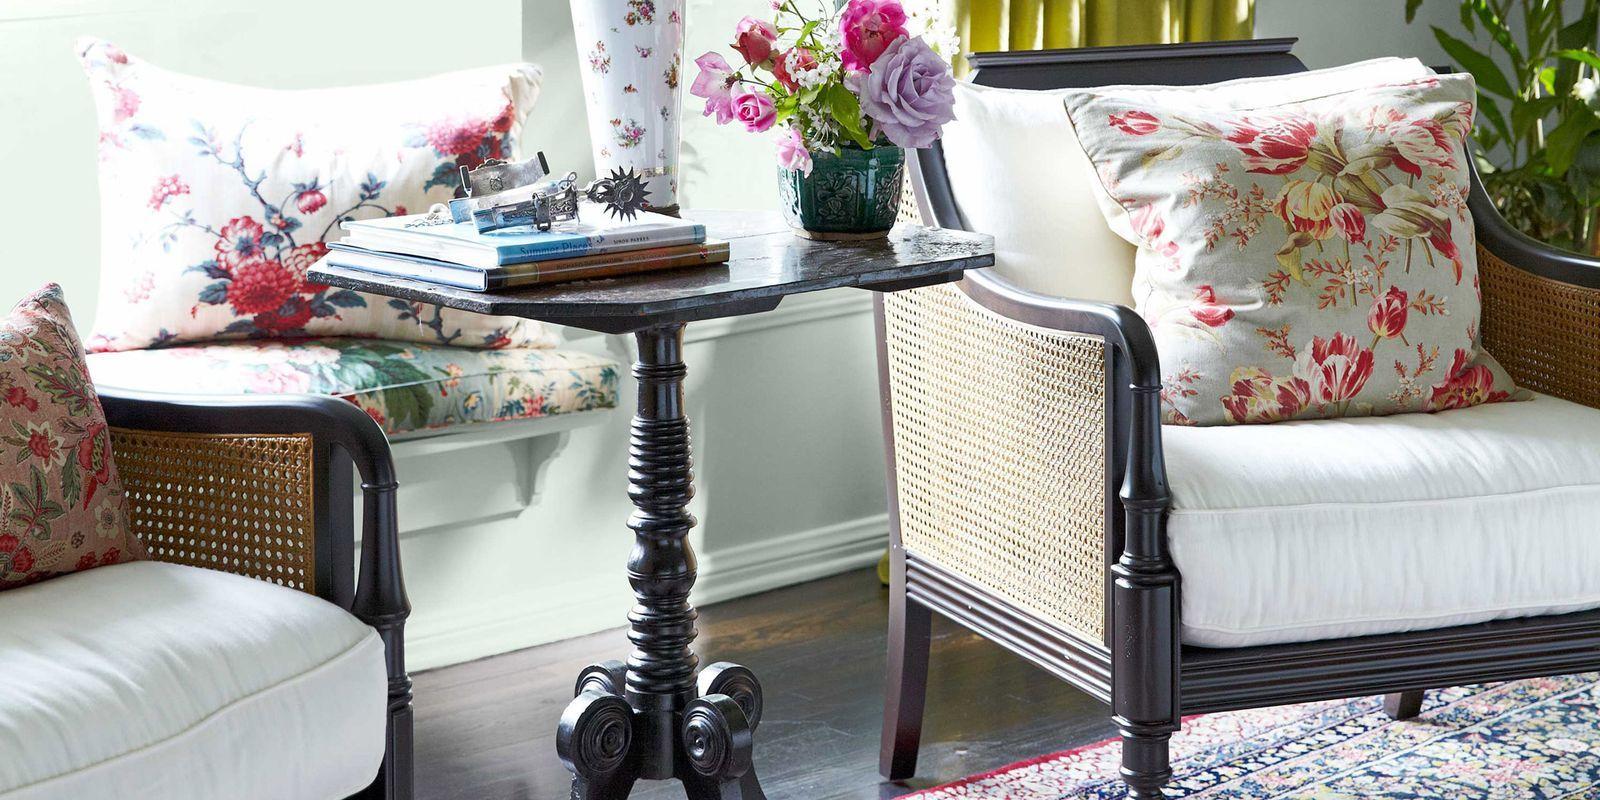 kensington cane chairs